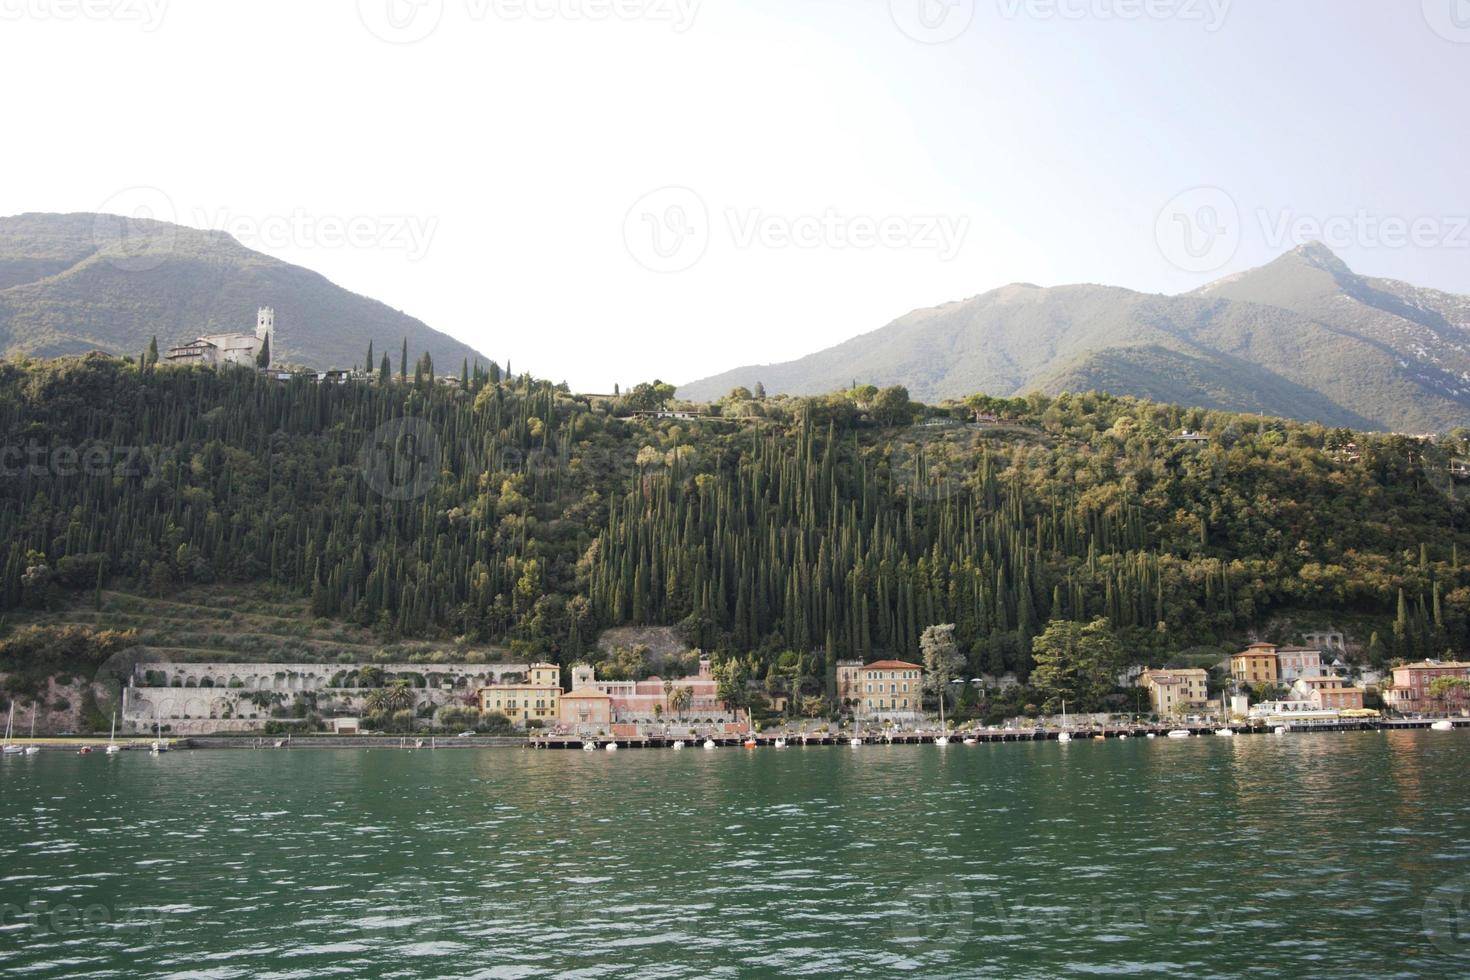 Italy, Lake Garda - village photo